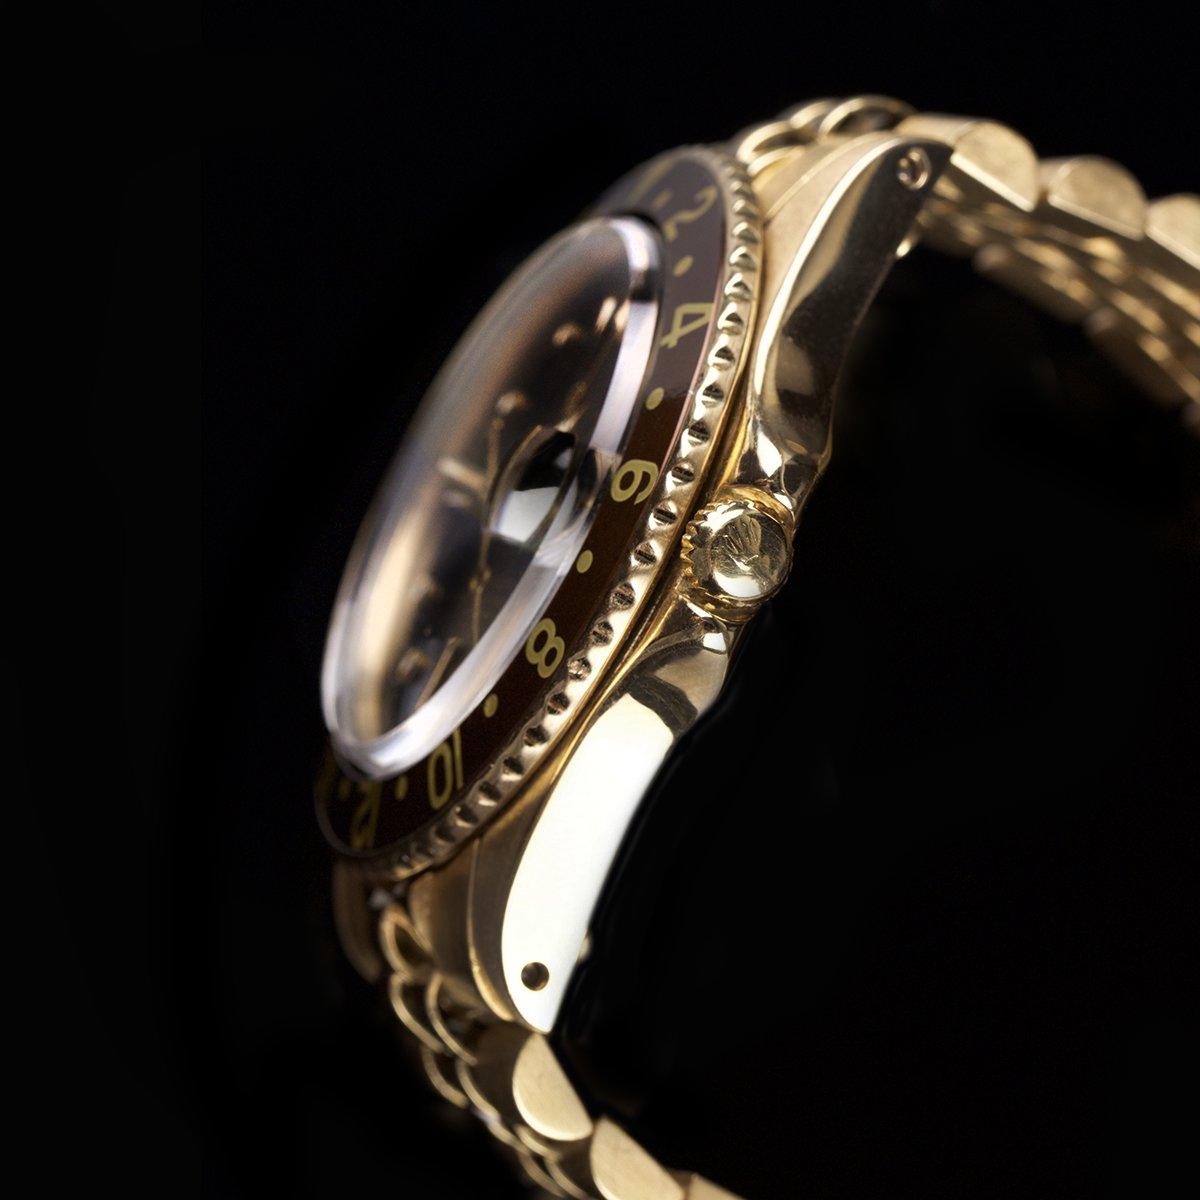 Stunning Rolex GMT 1675 18k Gold Nipple Dial Tobacco Bezel